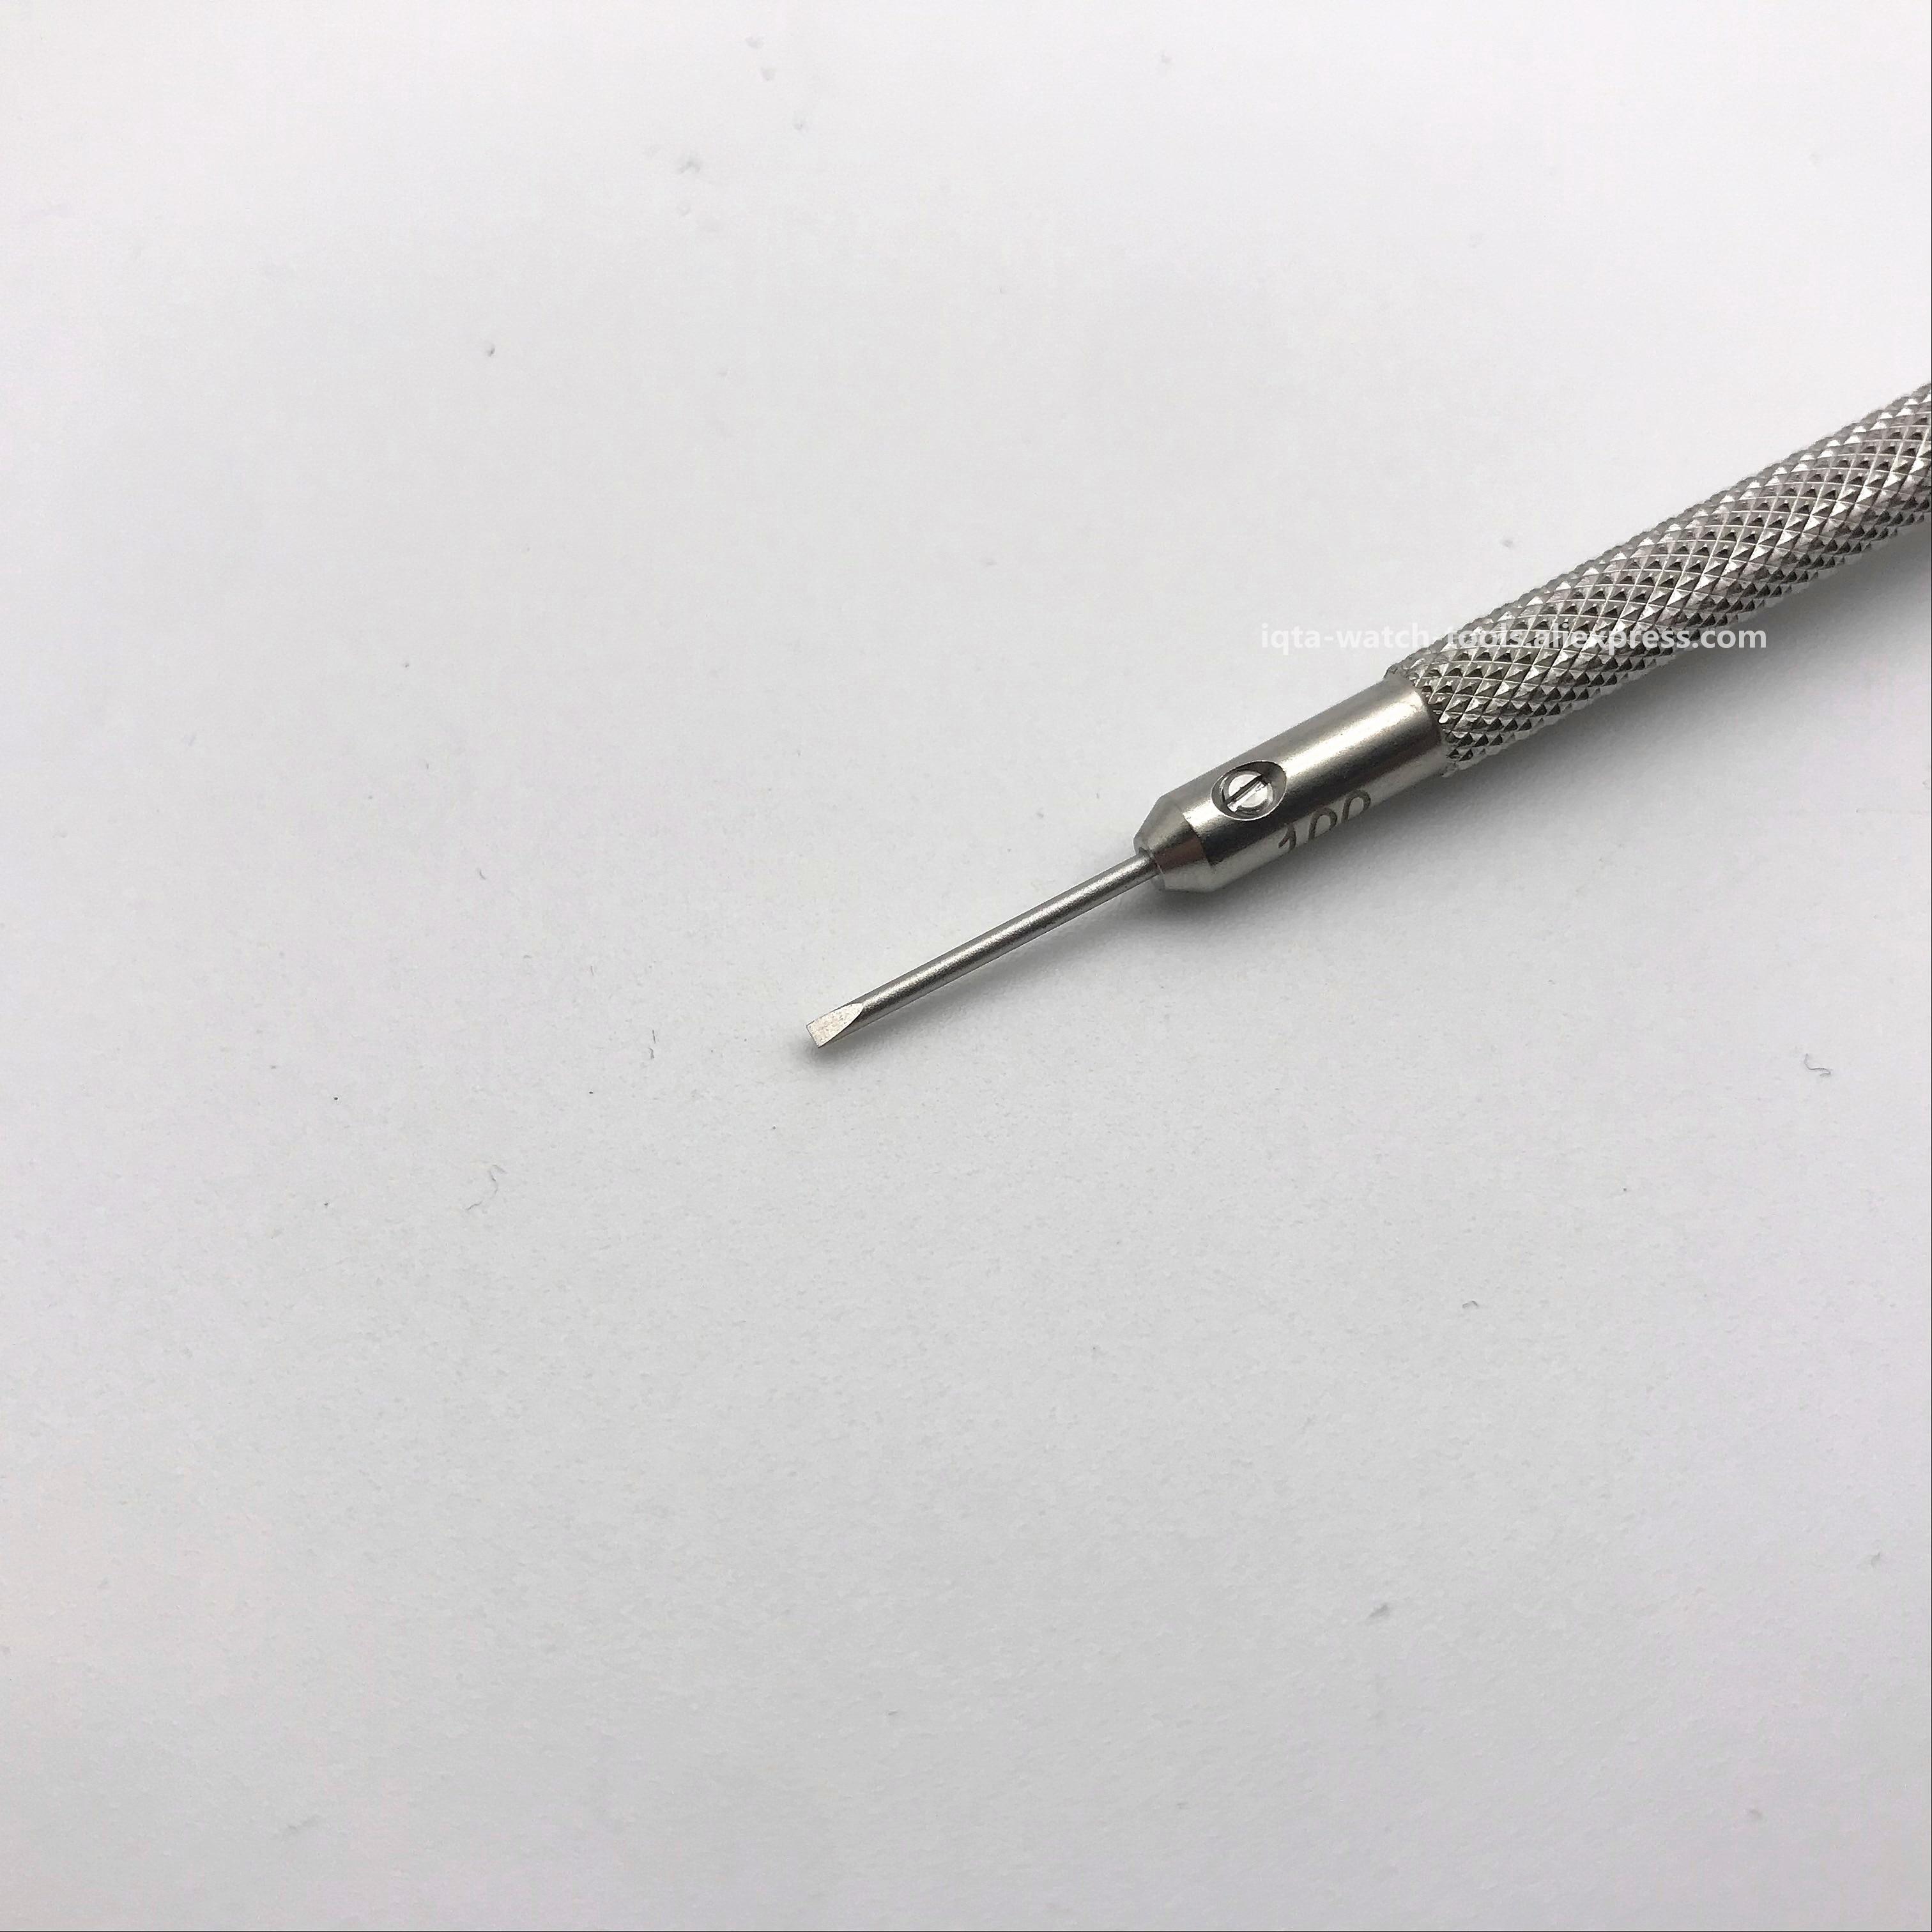 2pcs Premium Stainless Steel 0.8mm//1mm Screwdrivers Set Watchmaker Tools